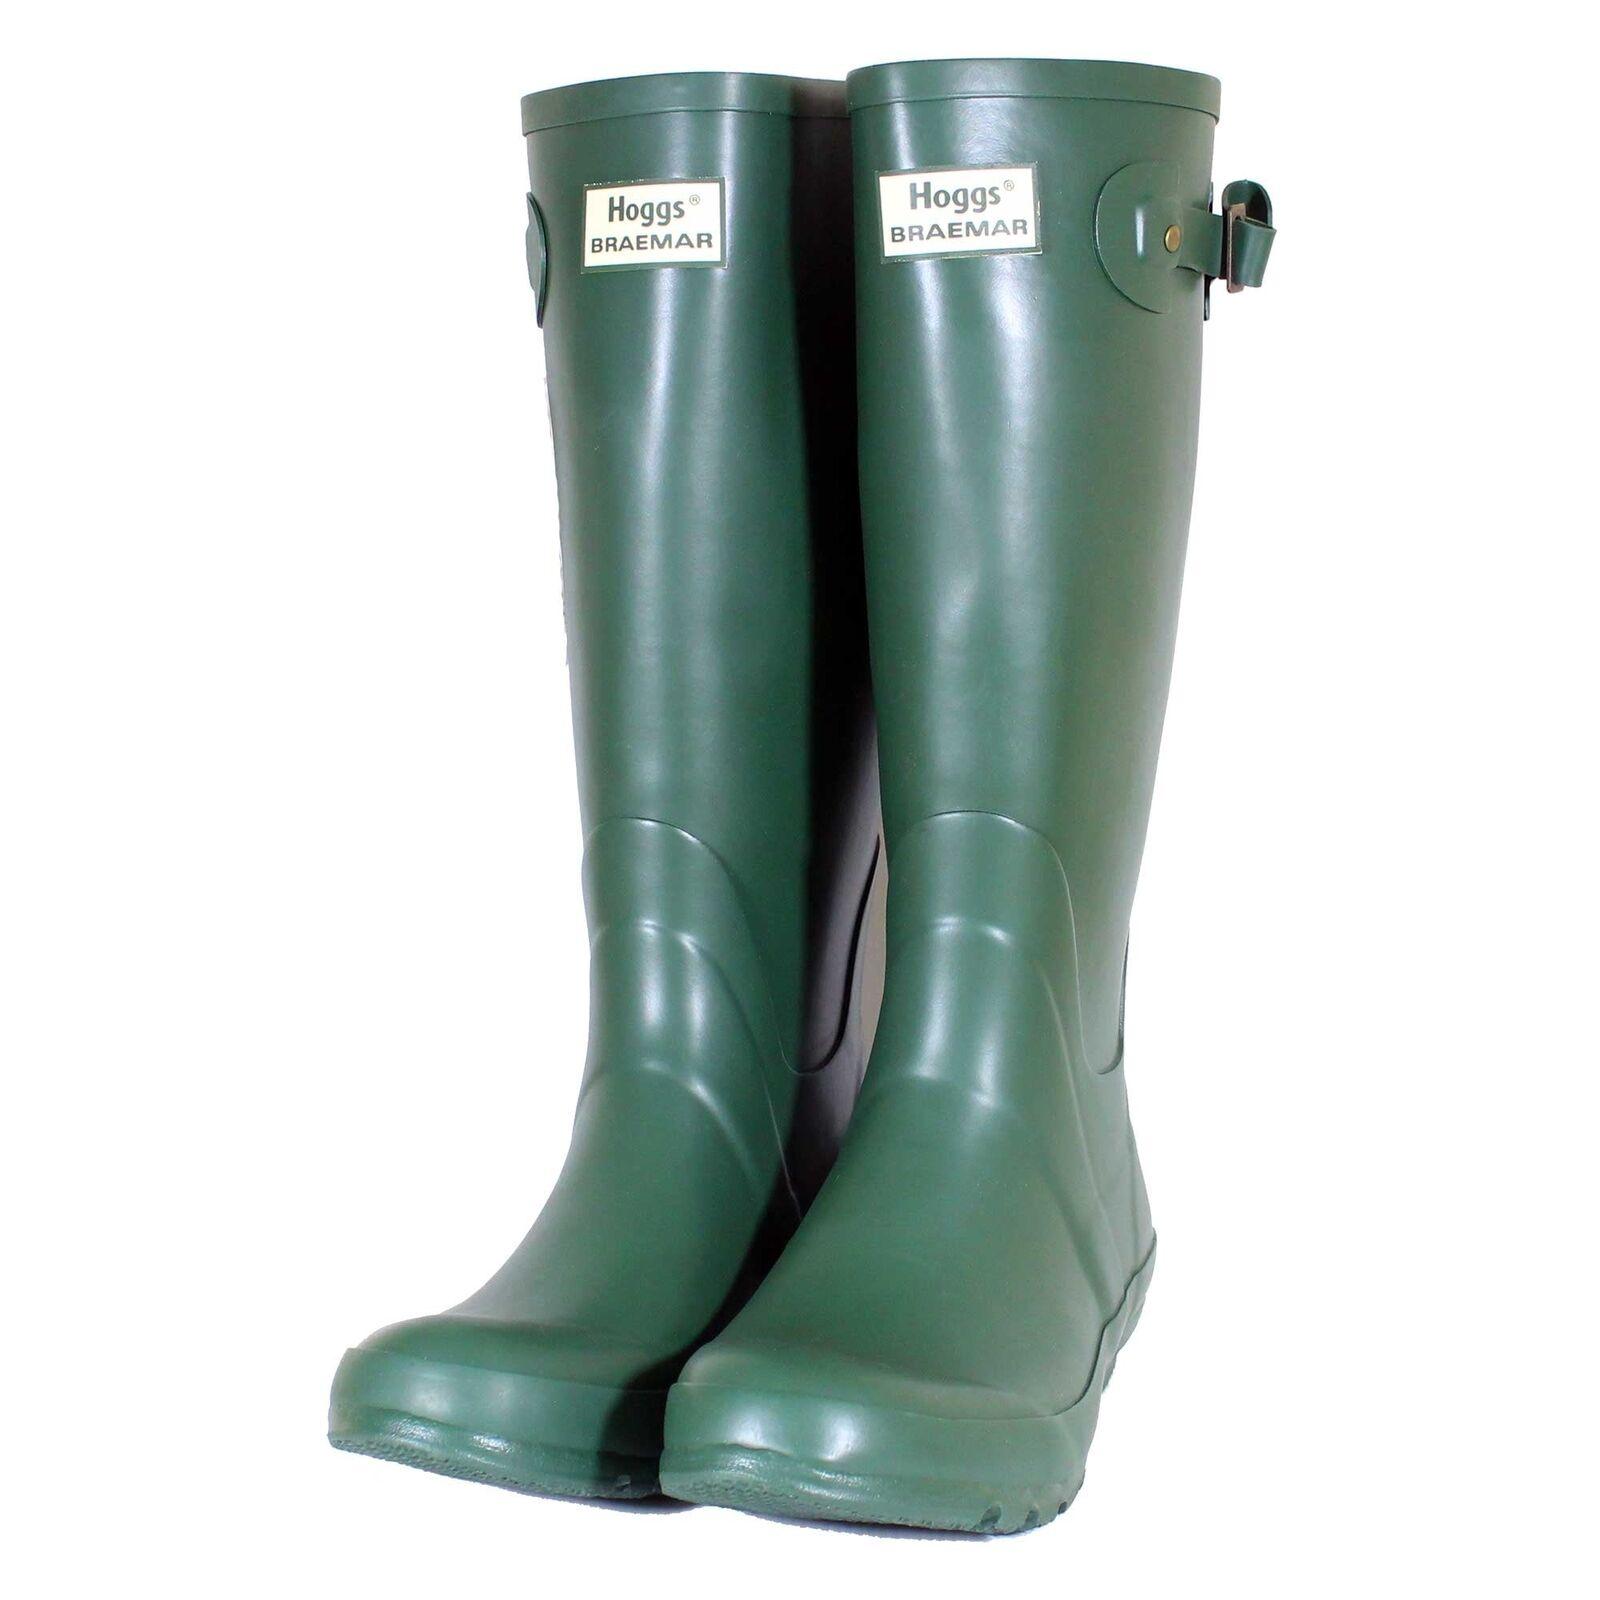 Hoggs Braemar Wellington botas verde (tamaños Reino Unido)